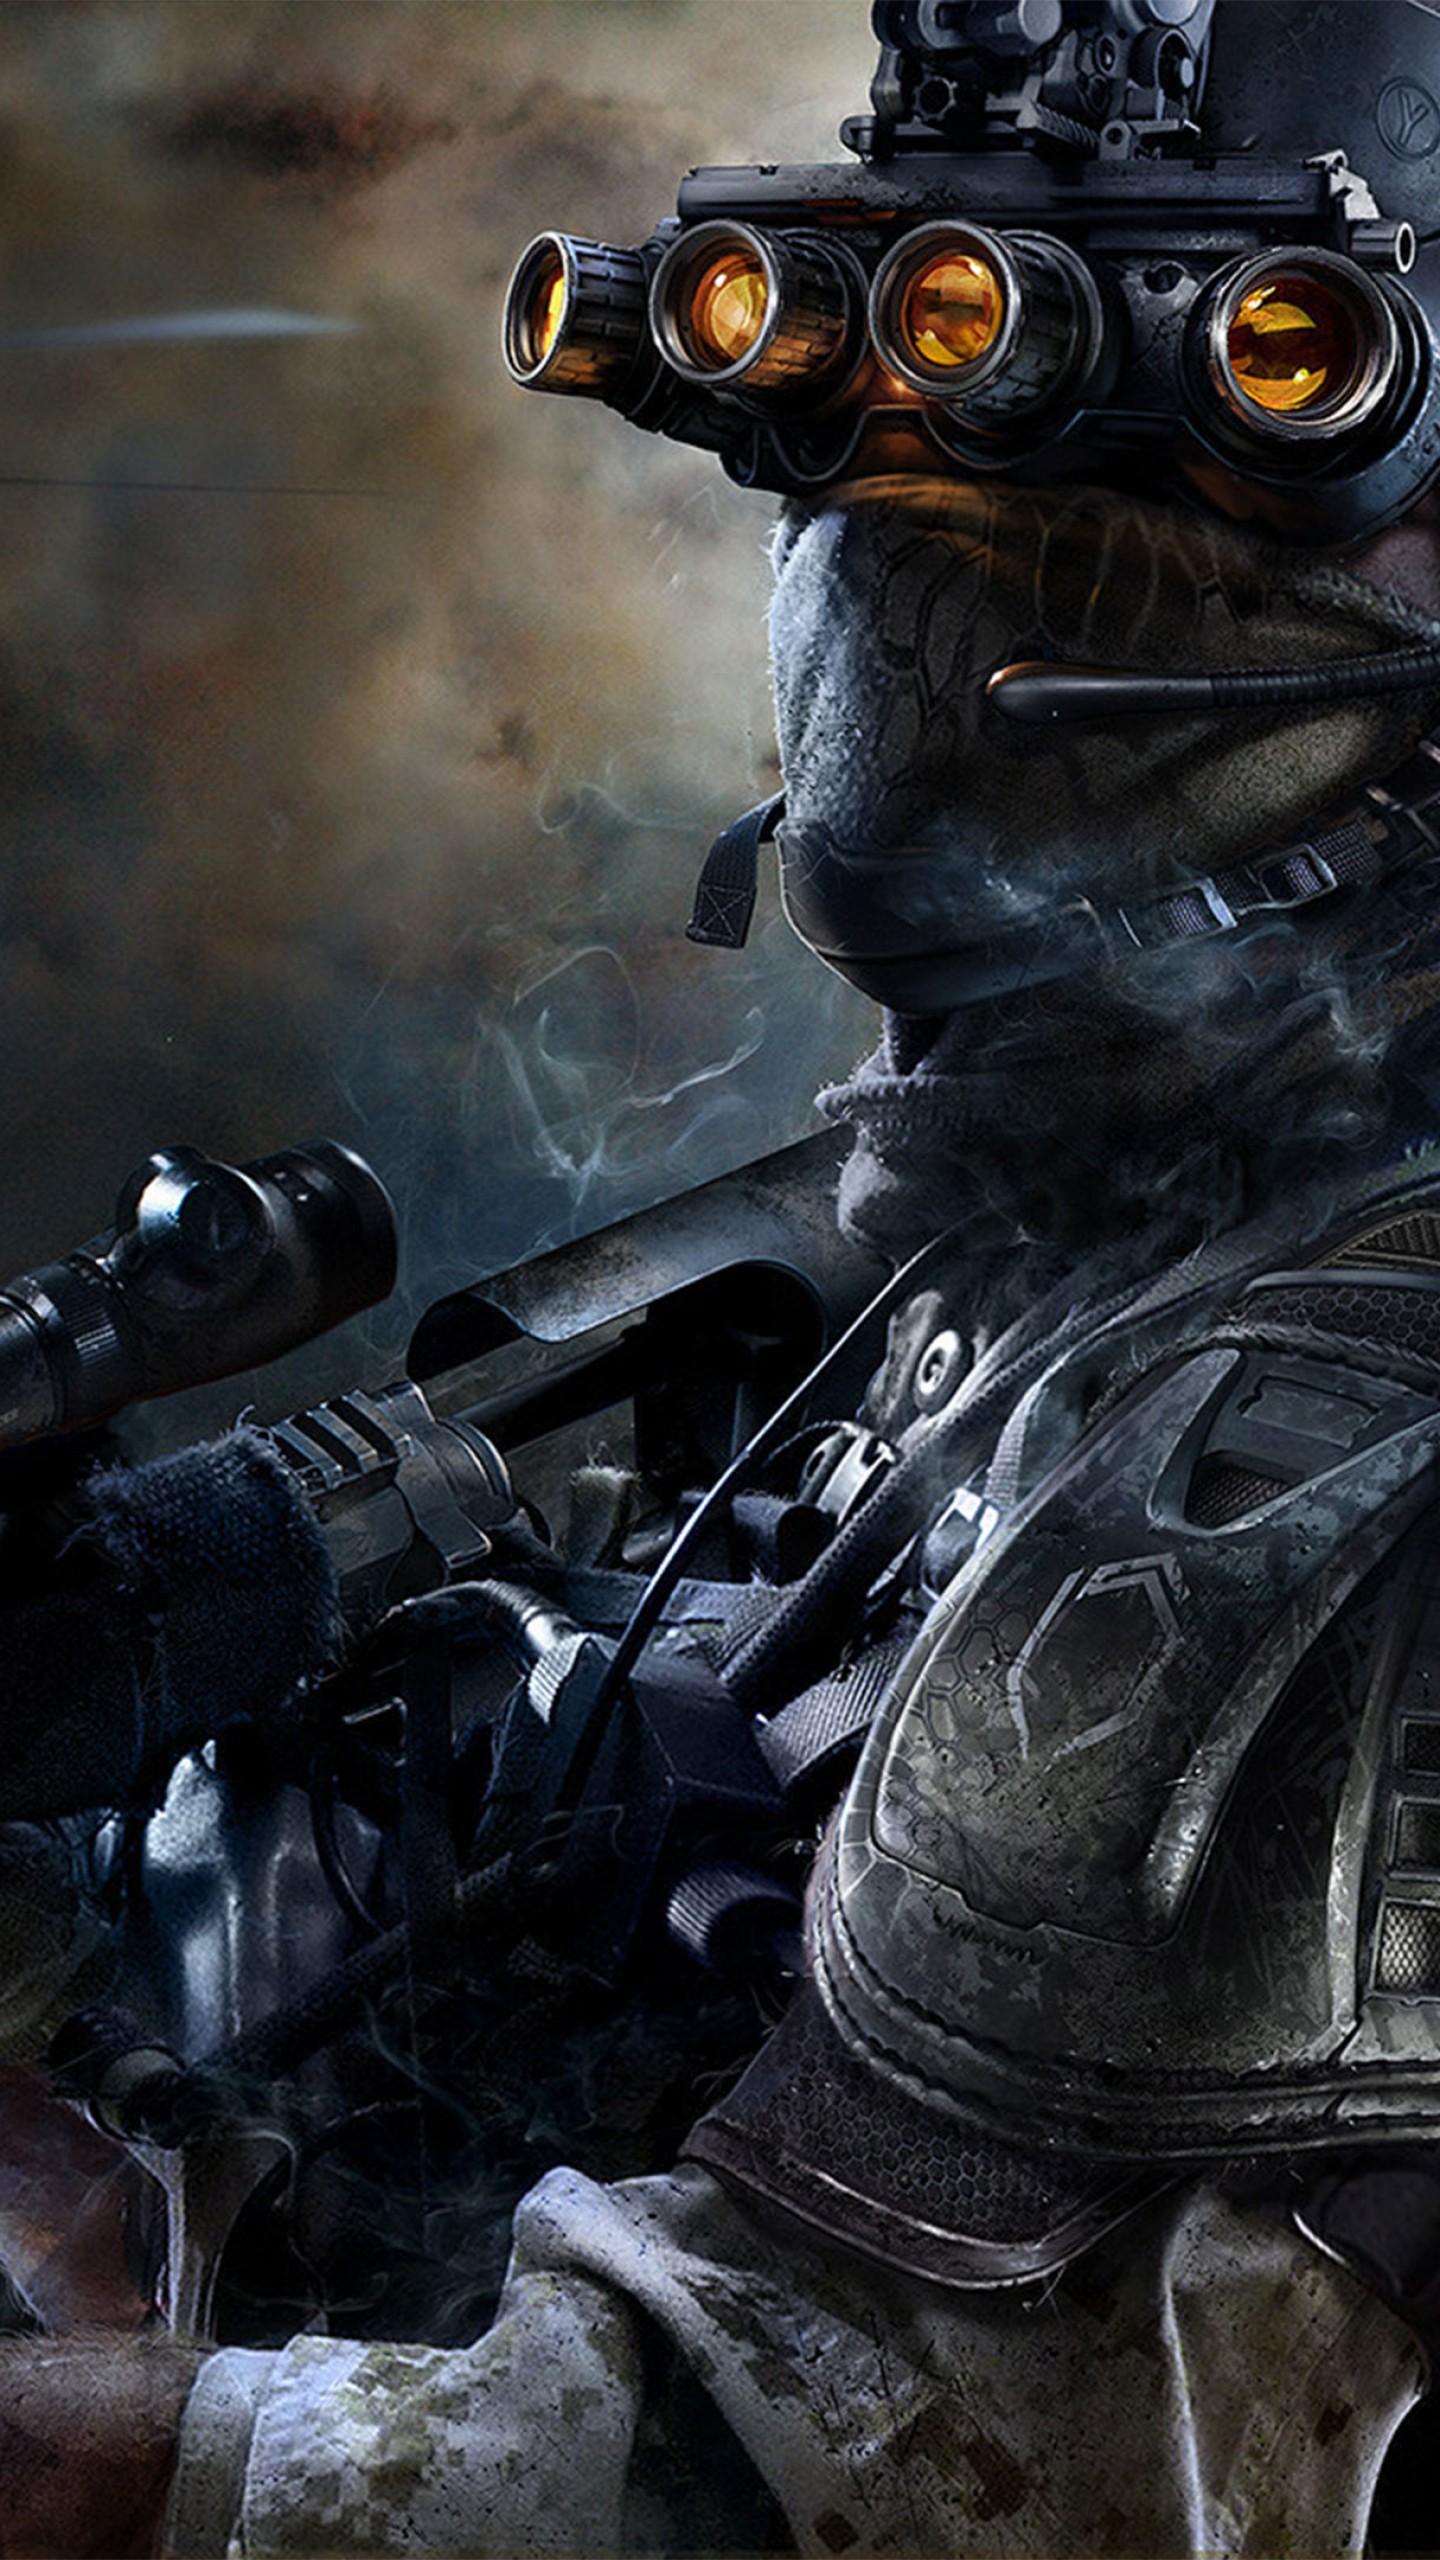 Soldier Girls Wallpapers Wallpaper Sniper Ghost Warrior 3 Shooter Best Games